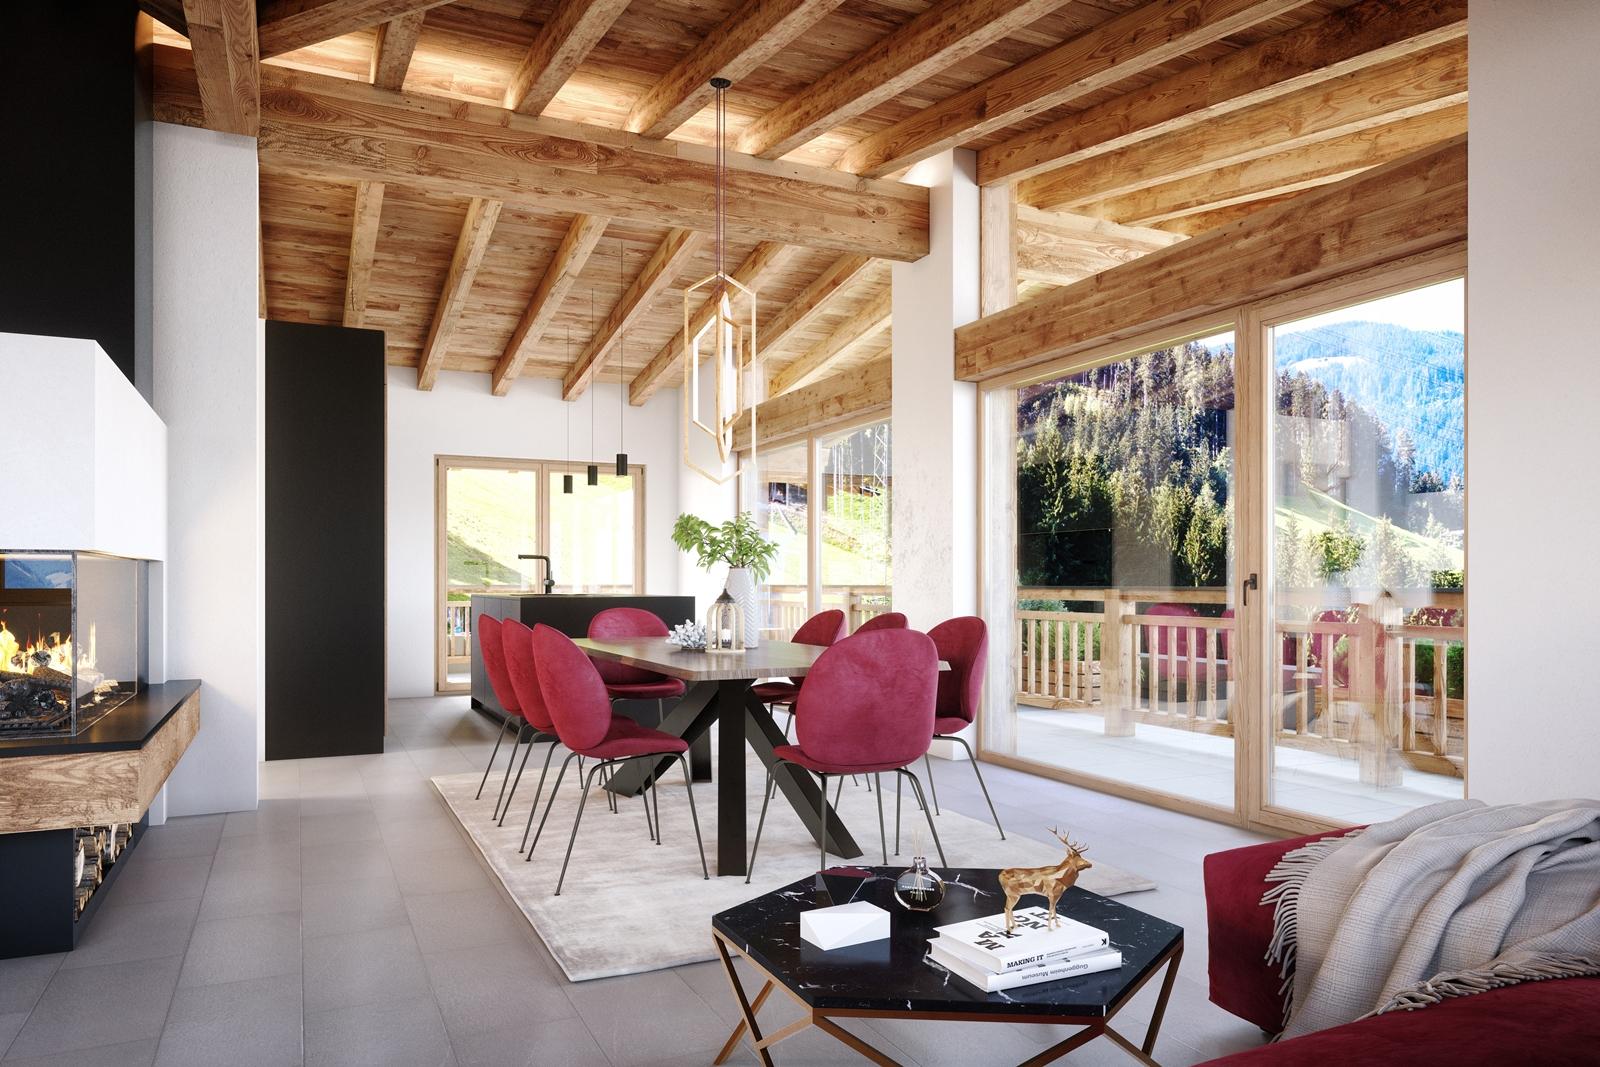 Architekturvisualisierung BV Emberg Interior c010 01 – Anthrazit – ohne Logo